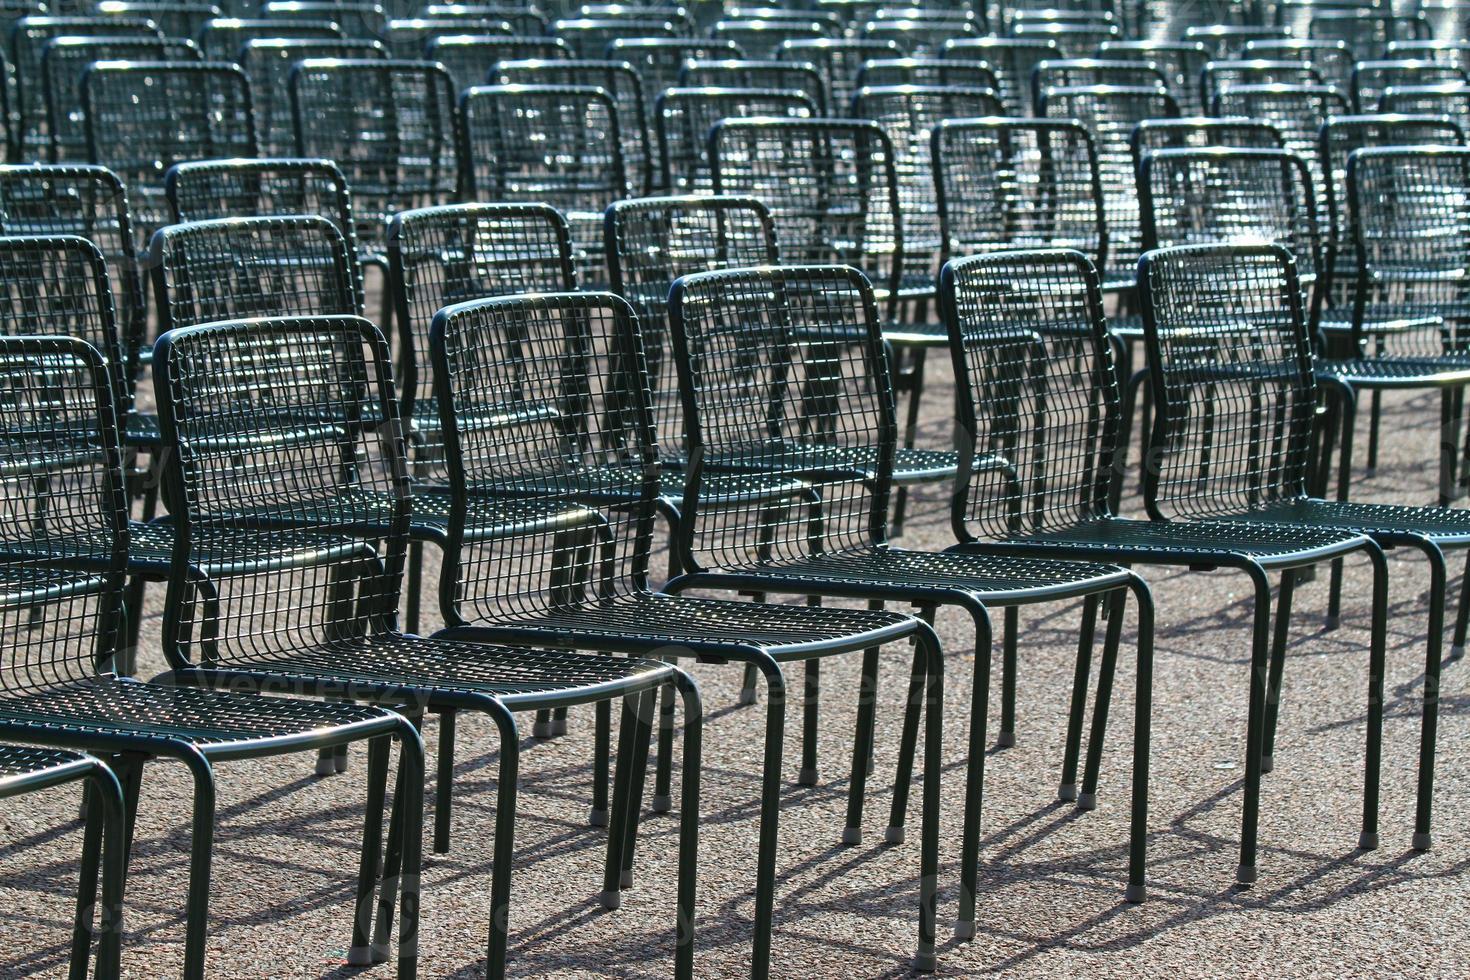 chaises vides photo